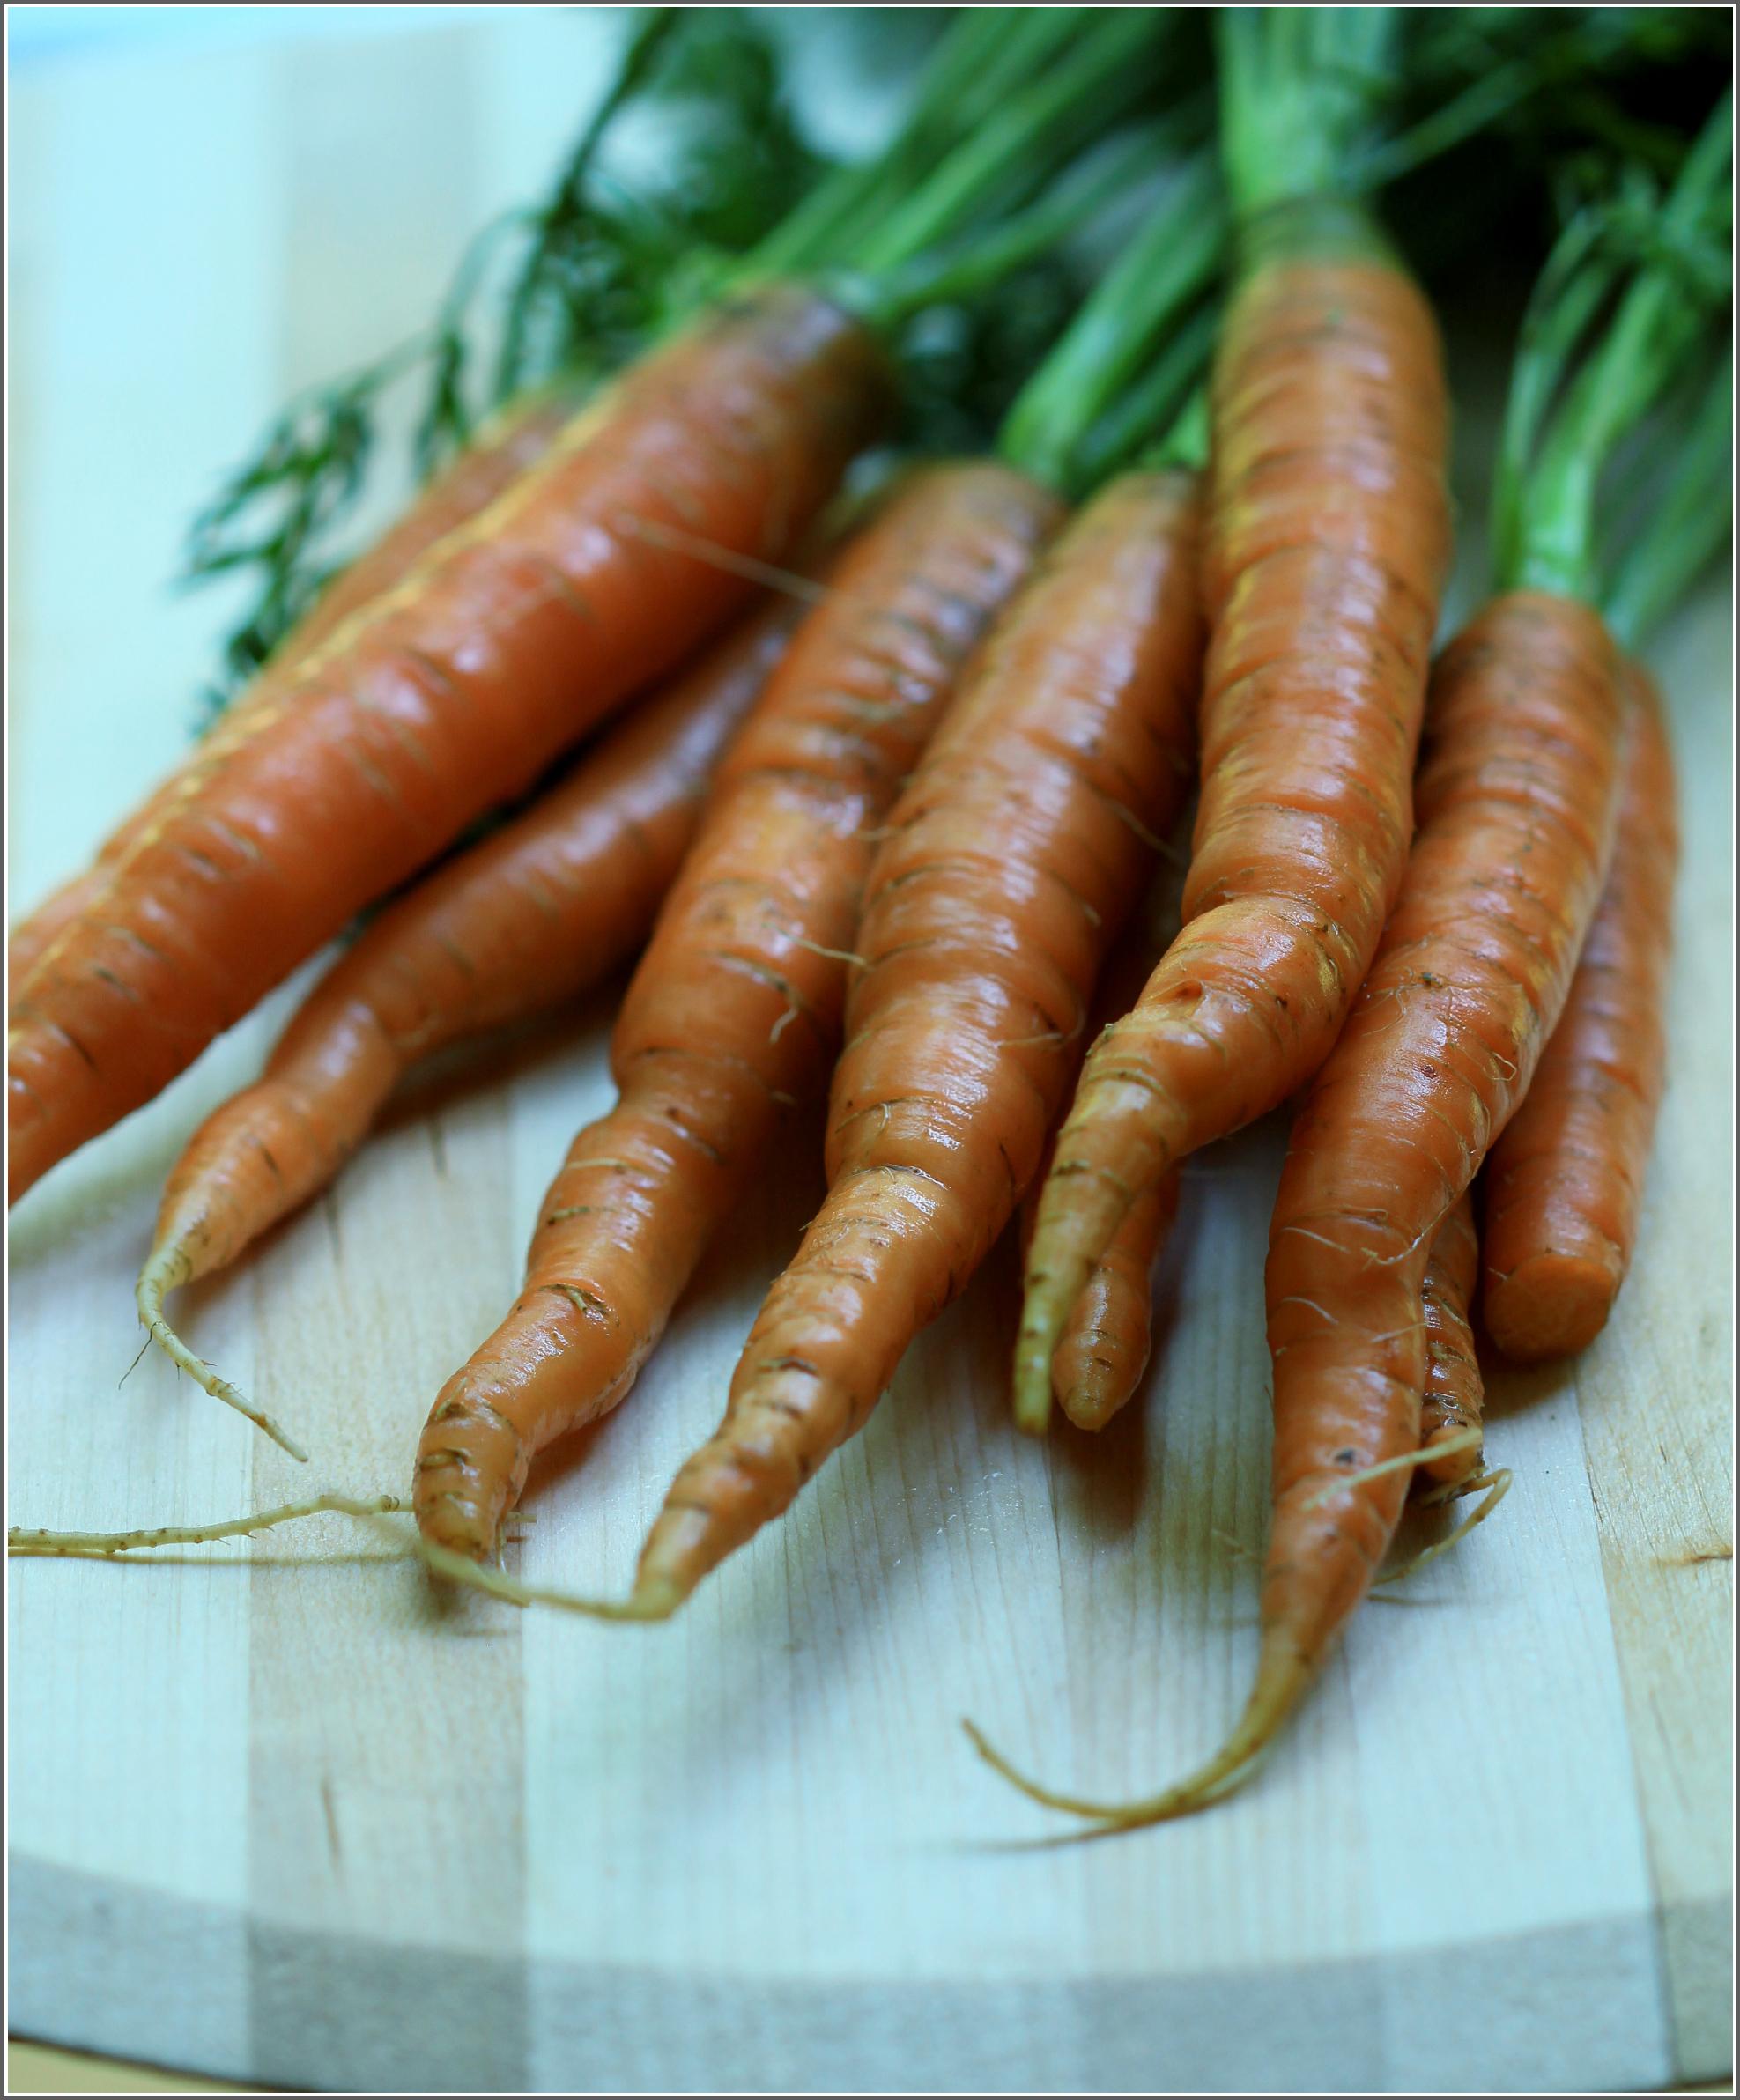 Carrots Upclose by Dena T Bray©